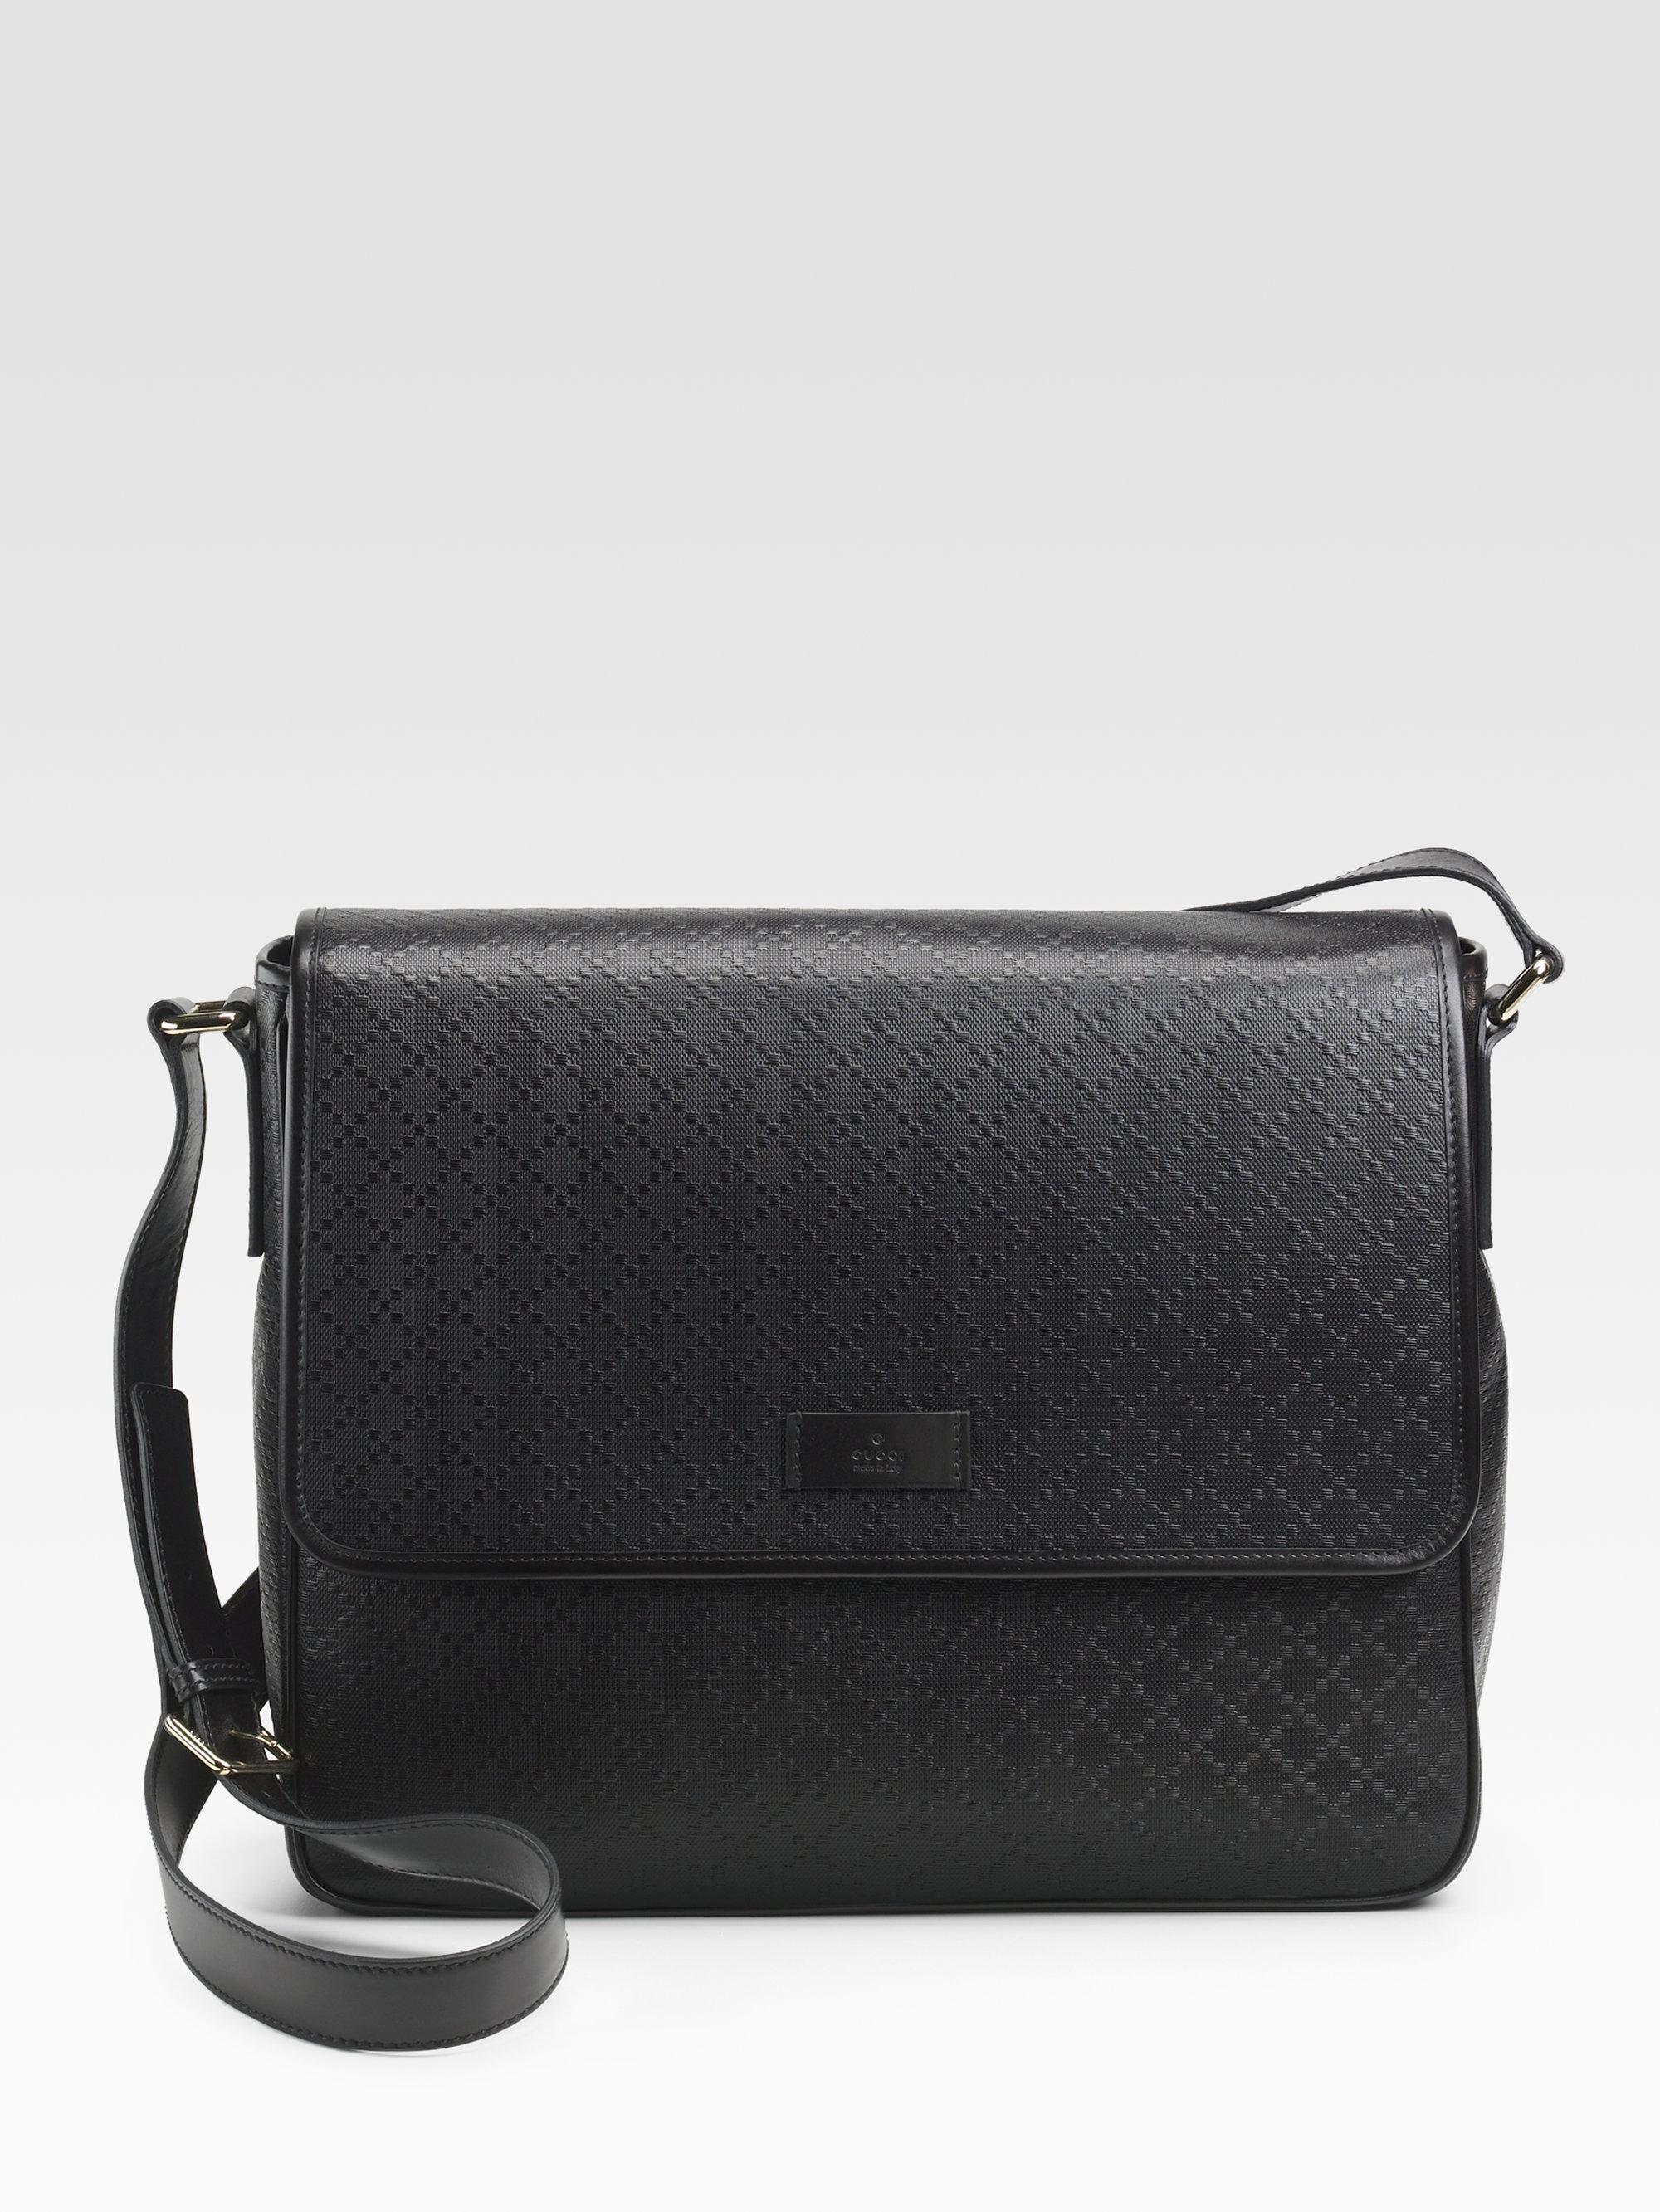 2dd772b2b17c19 Gucci Diamante Lux Messenger Bag in Black for Men - Lyst